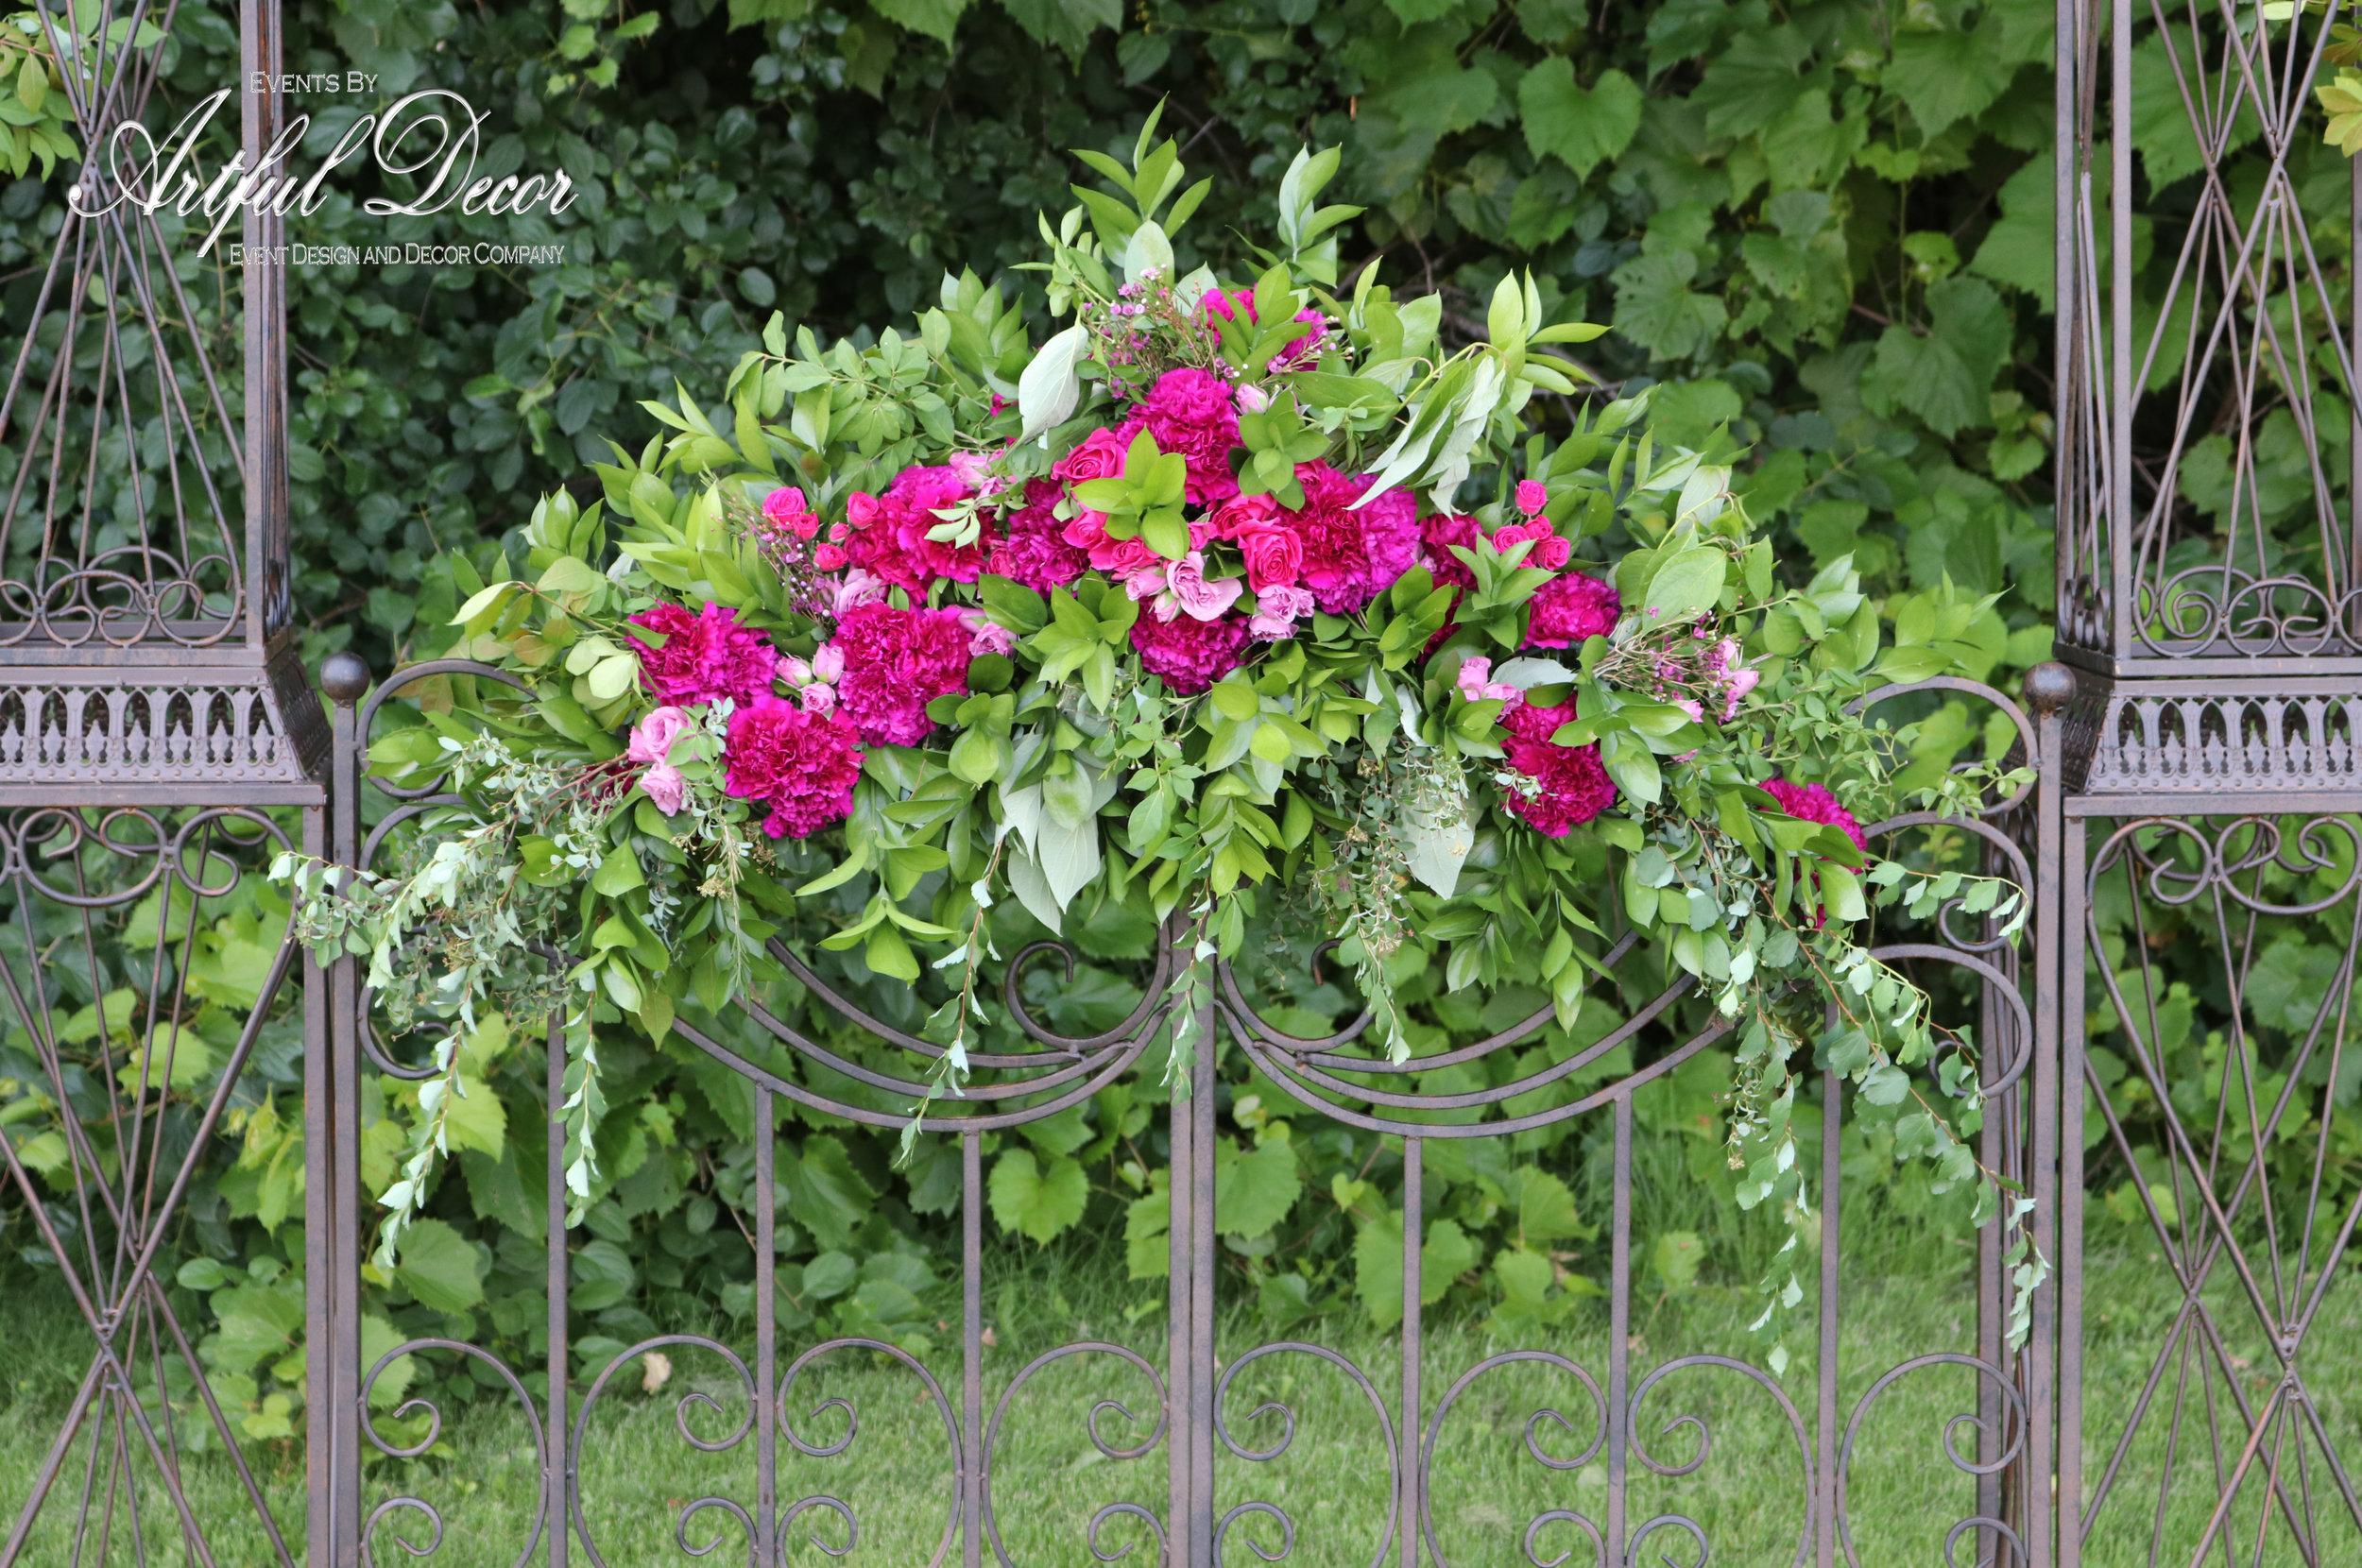 Garden Gate 25 Copyright.jpg